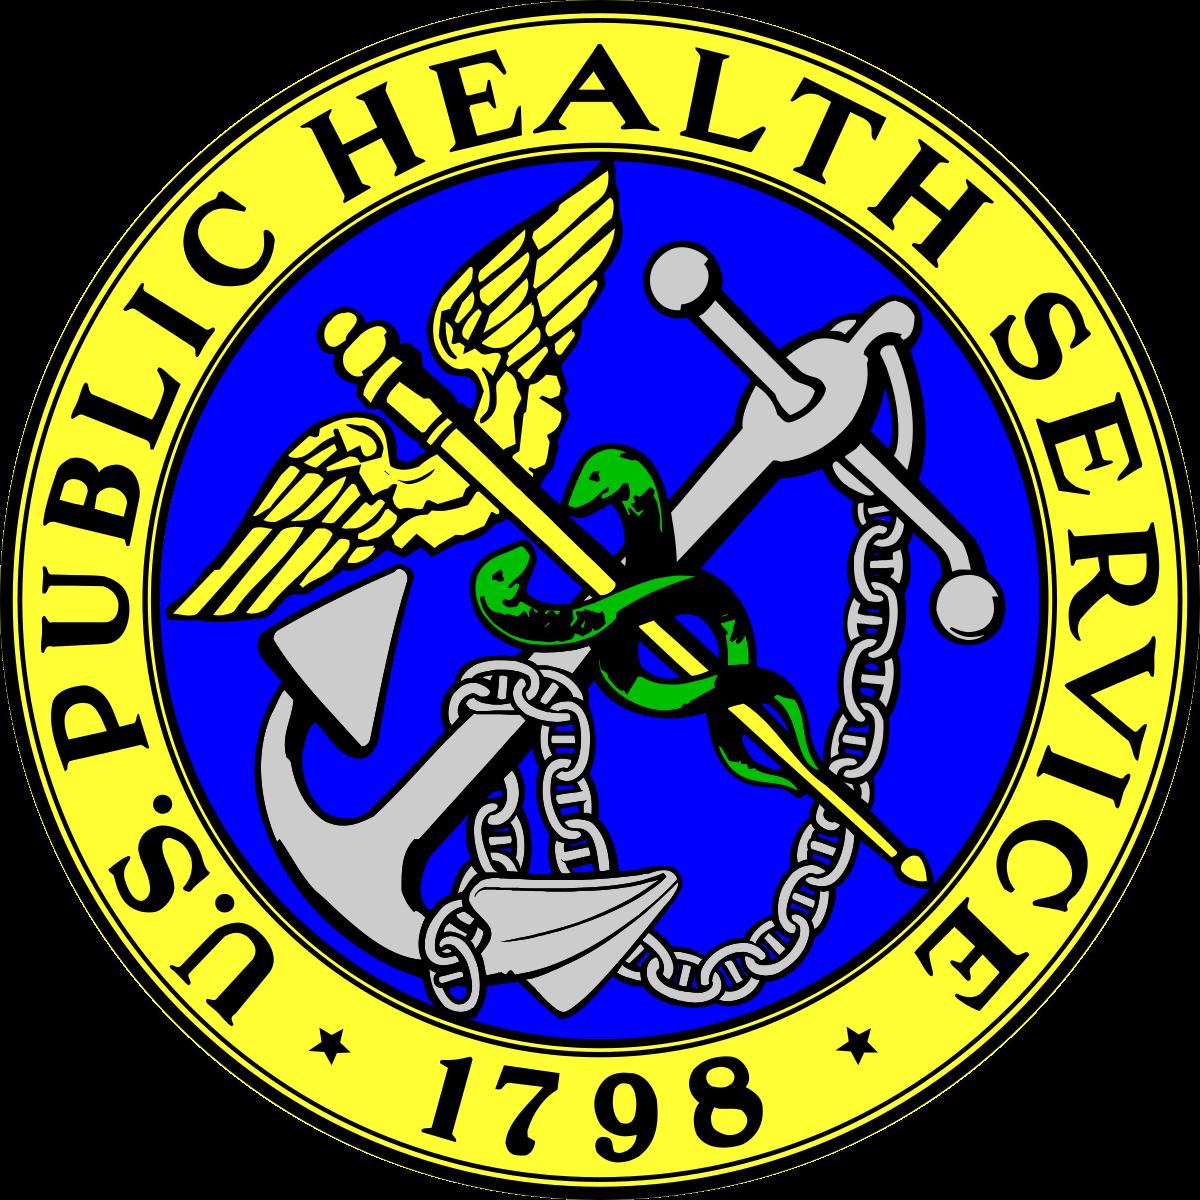 Logo of the Public Health Service, established 1798